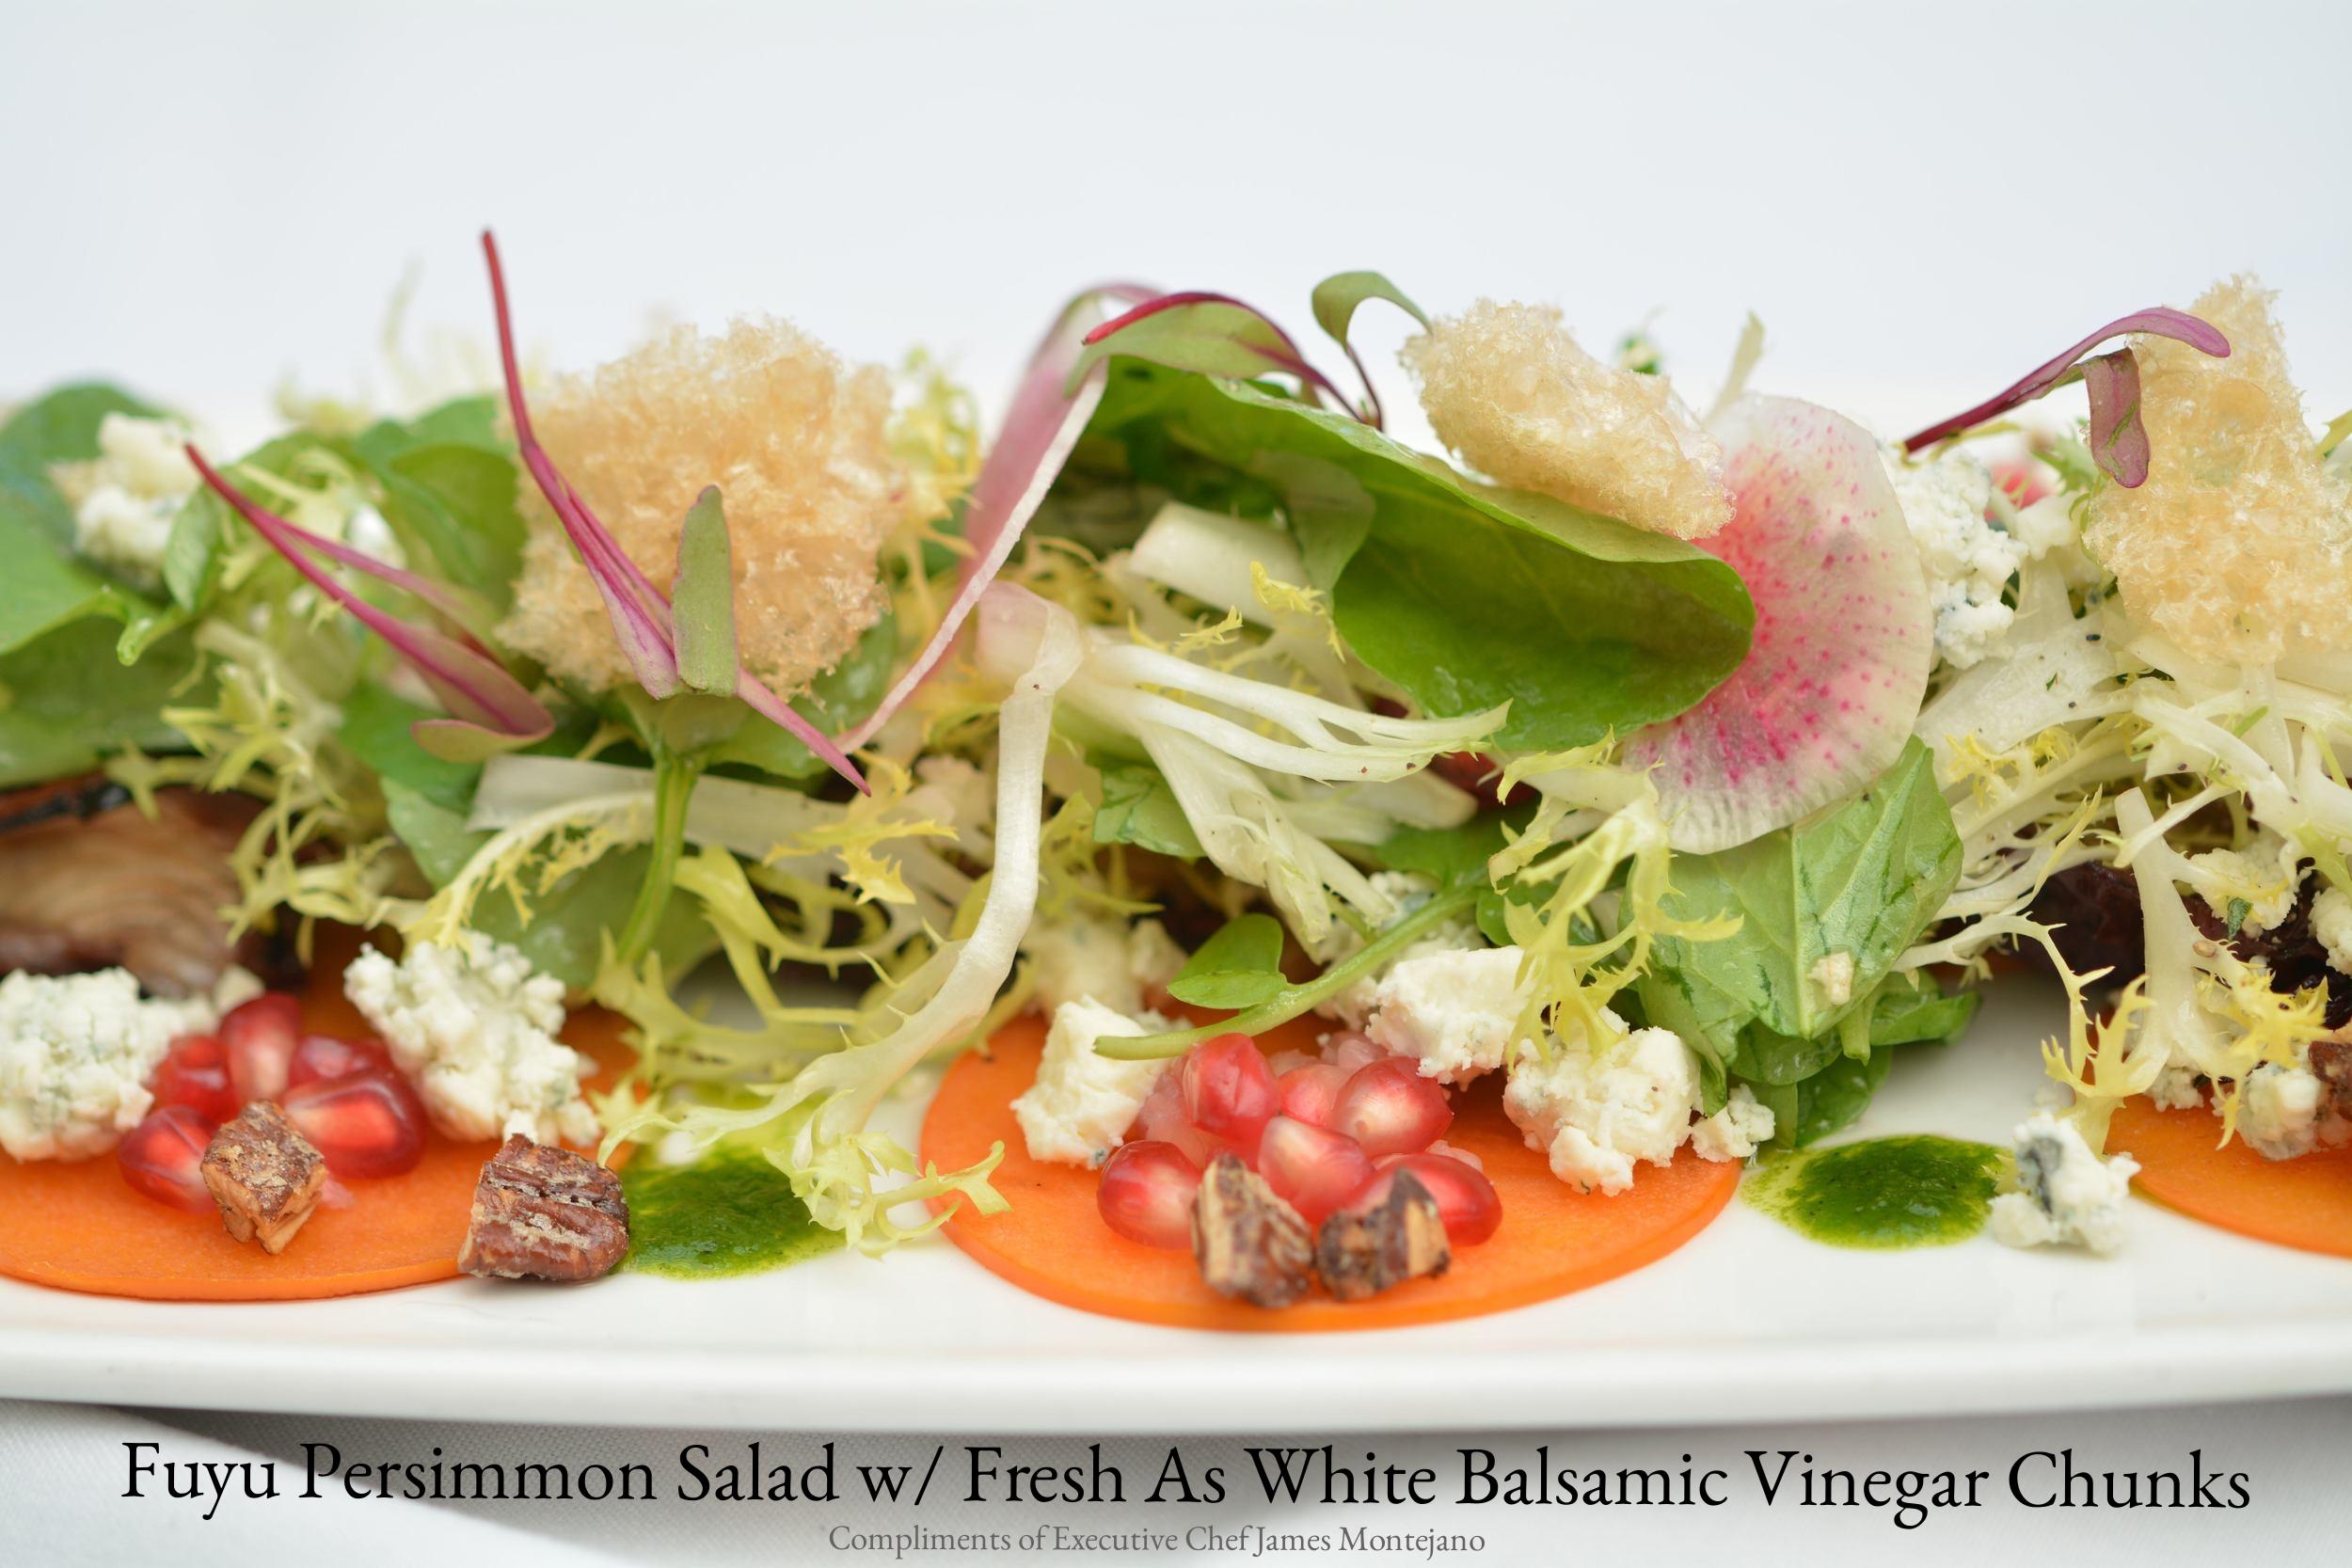 Fuyu Persimmon Salad copy.jpg